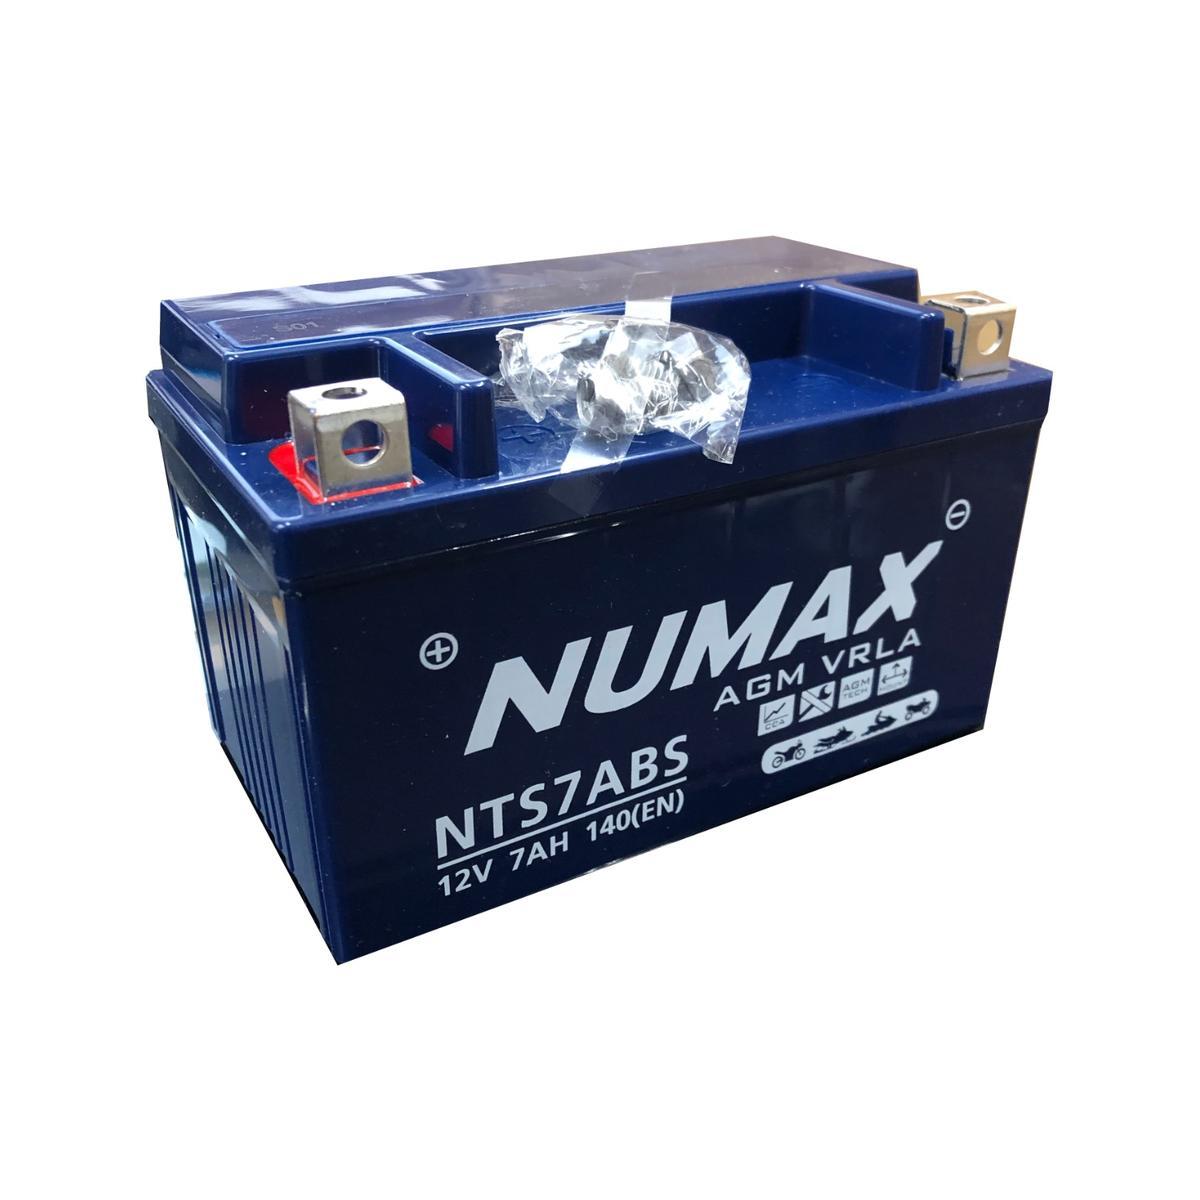 Numax NTS7ABS 12v Motorbike Bike Battery SUZUKI 250cc GSF 250 YTX7A-4